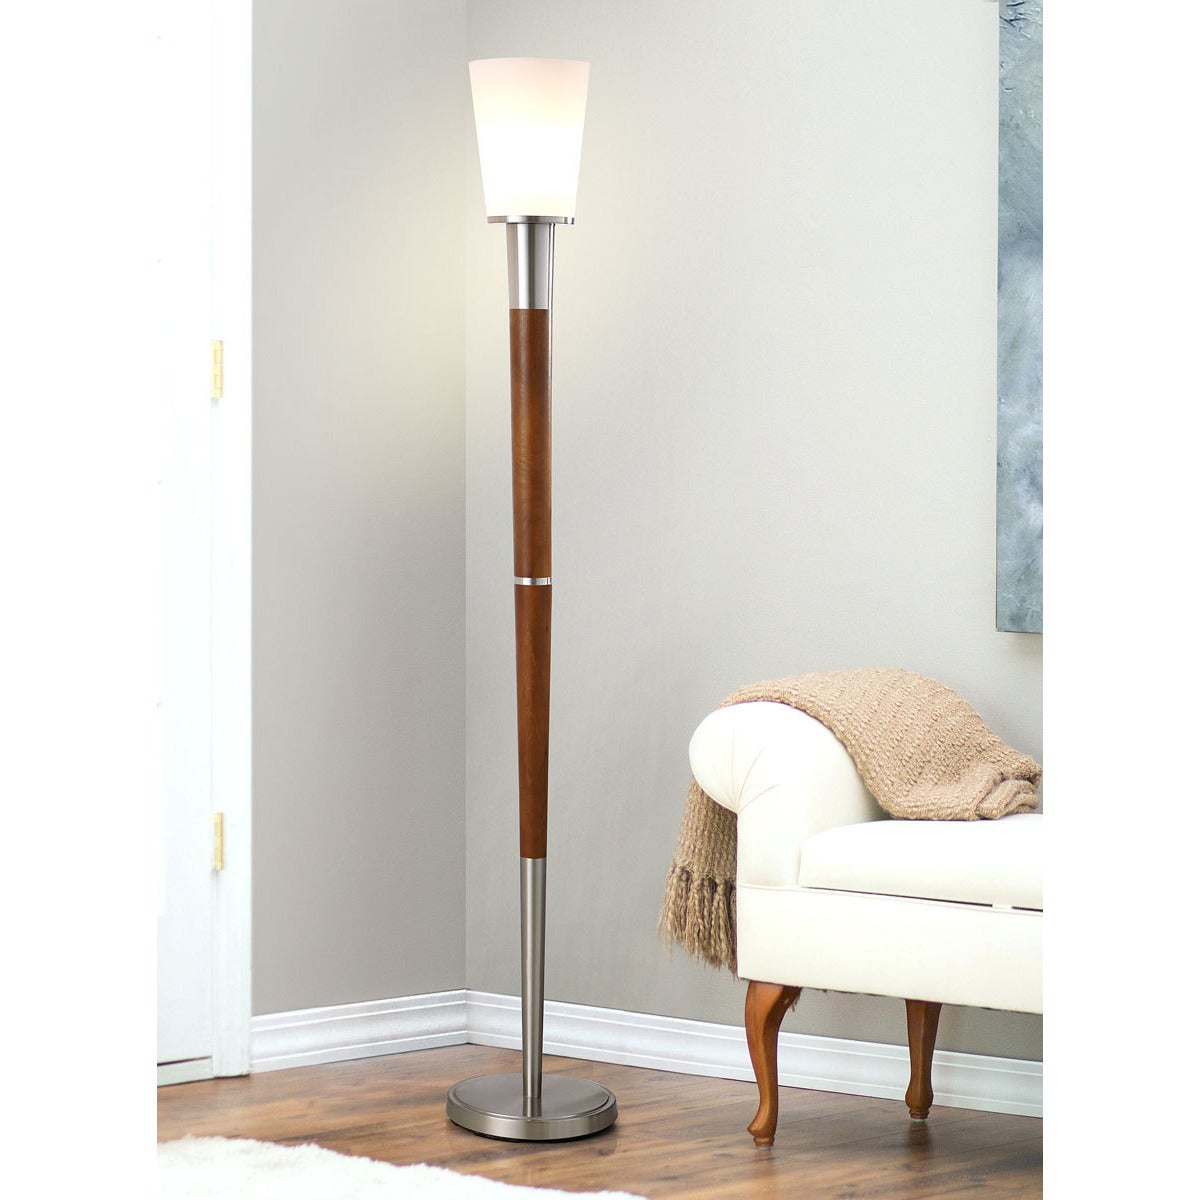 Manhattan Walnut Finish Wood Gl Shade 72 5 Inch H Torchier Floor Lamp